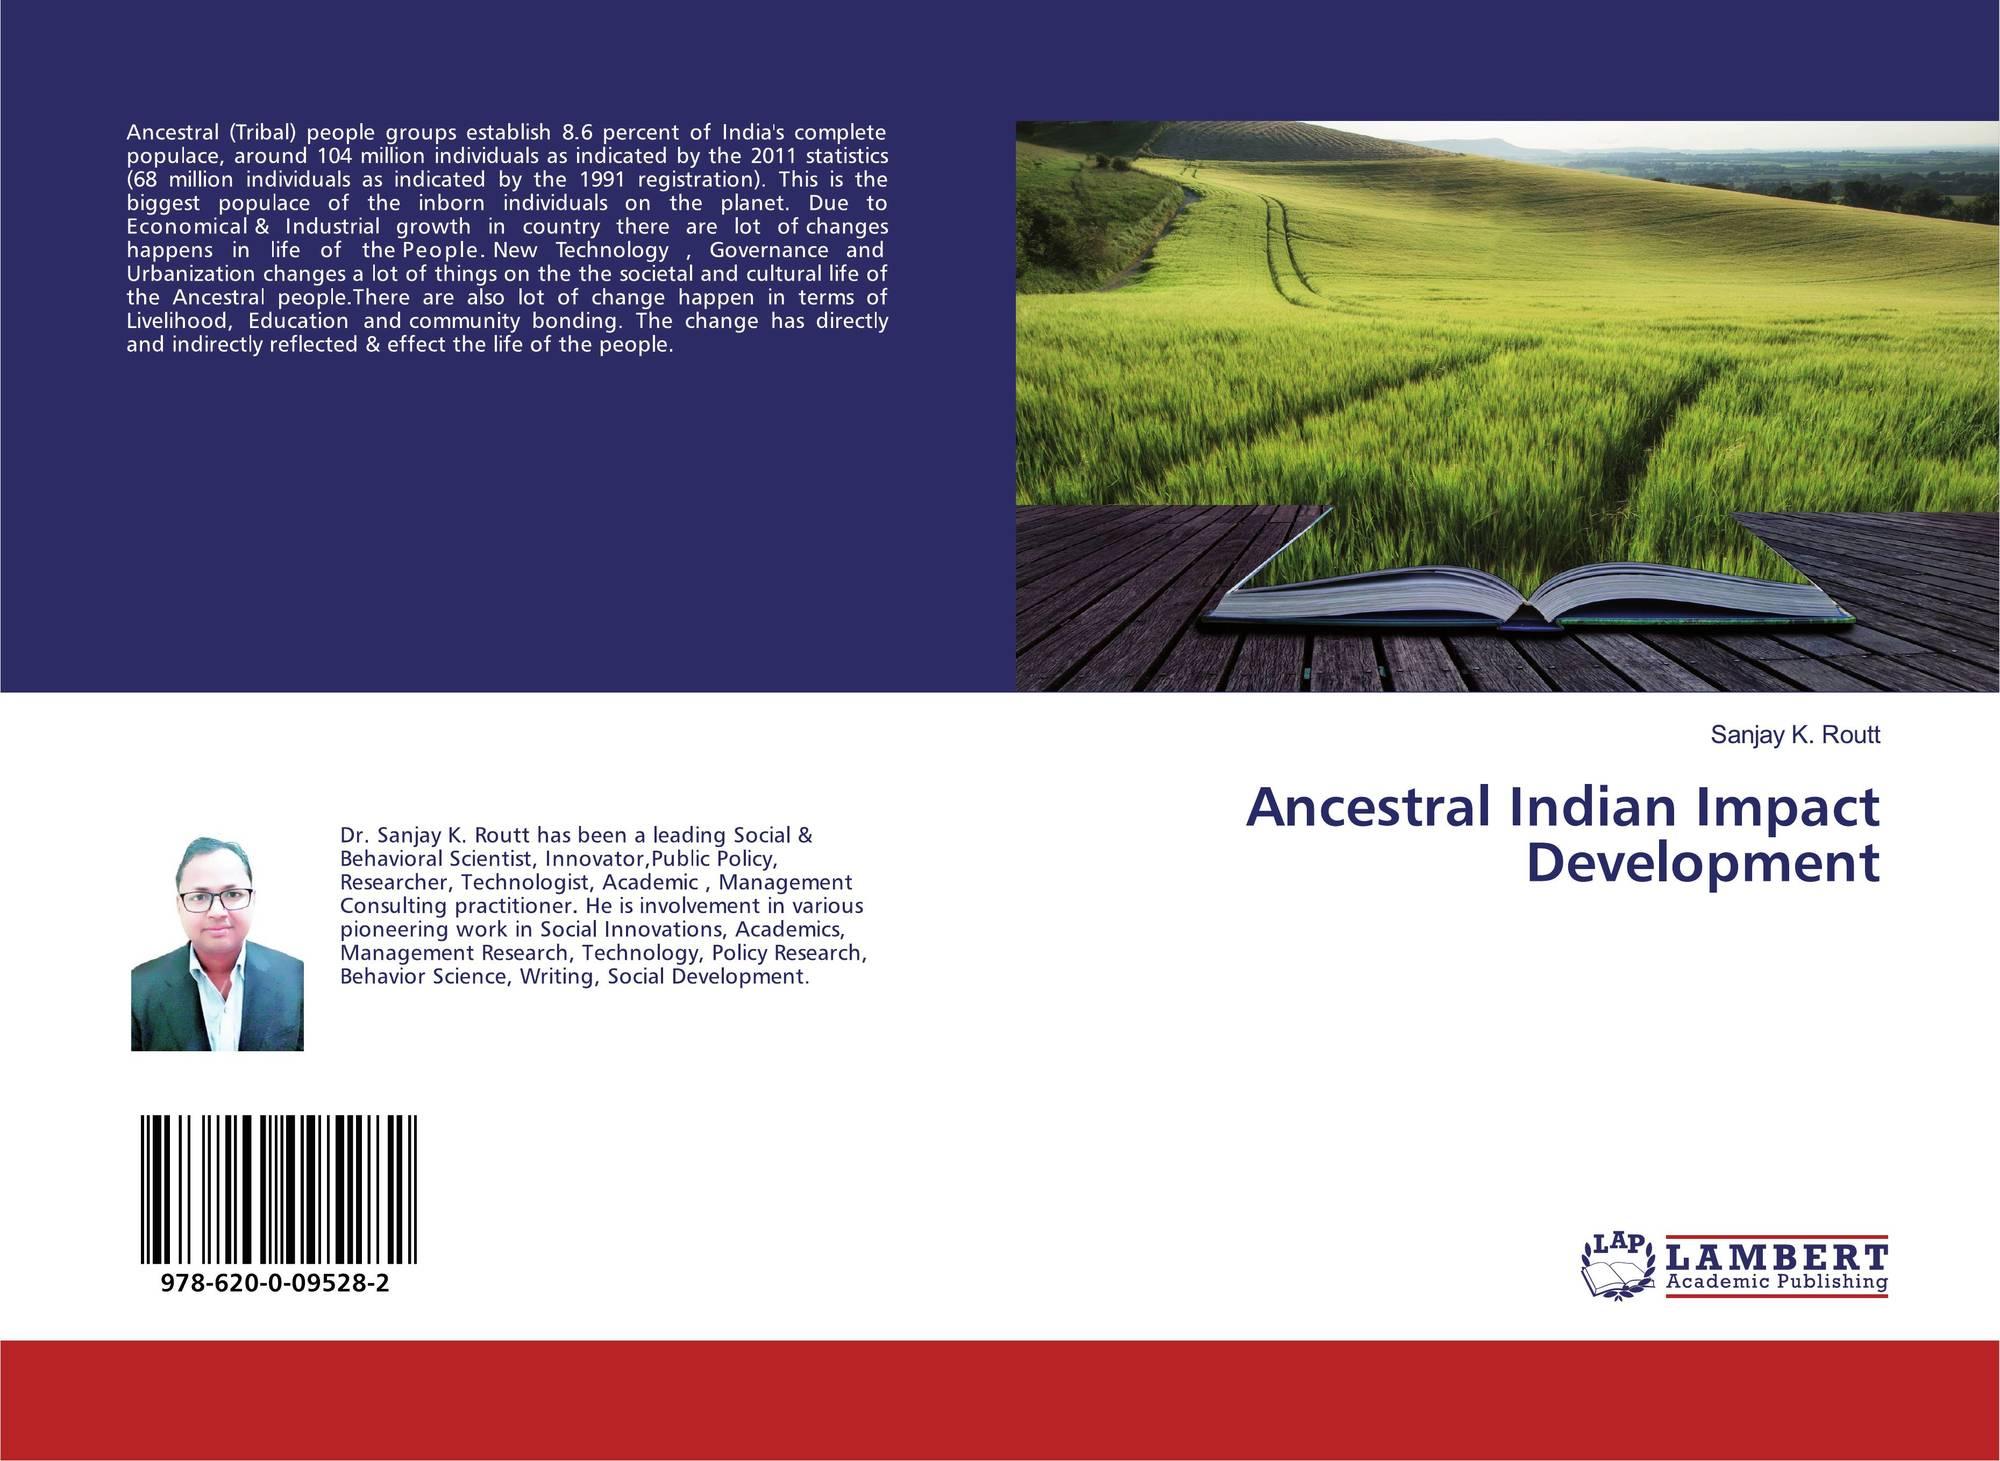 Ancestral Indian Impact Development, 978-620-0-09528-2